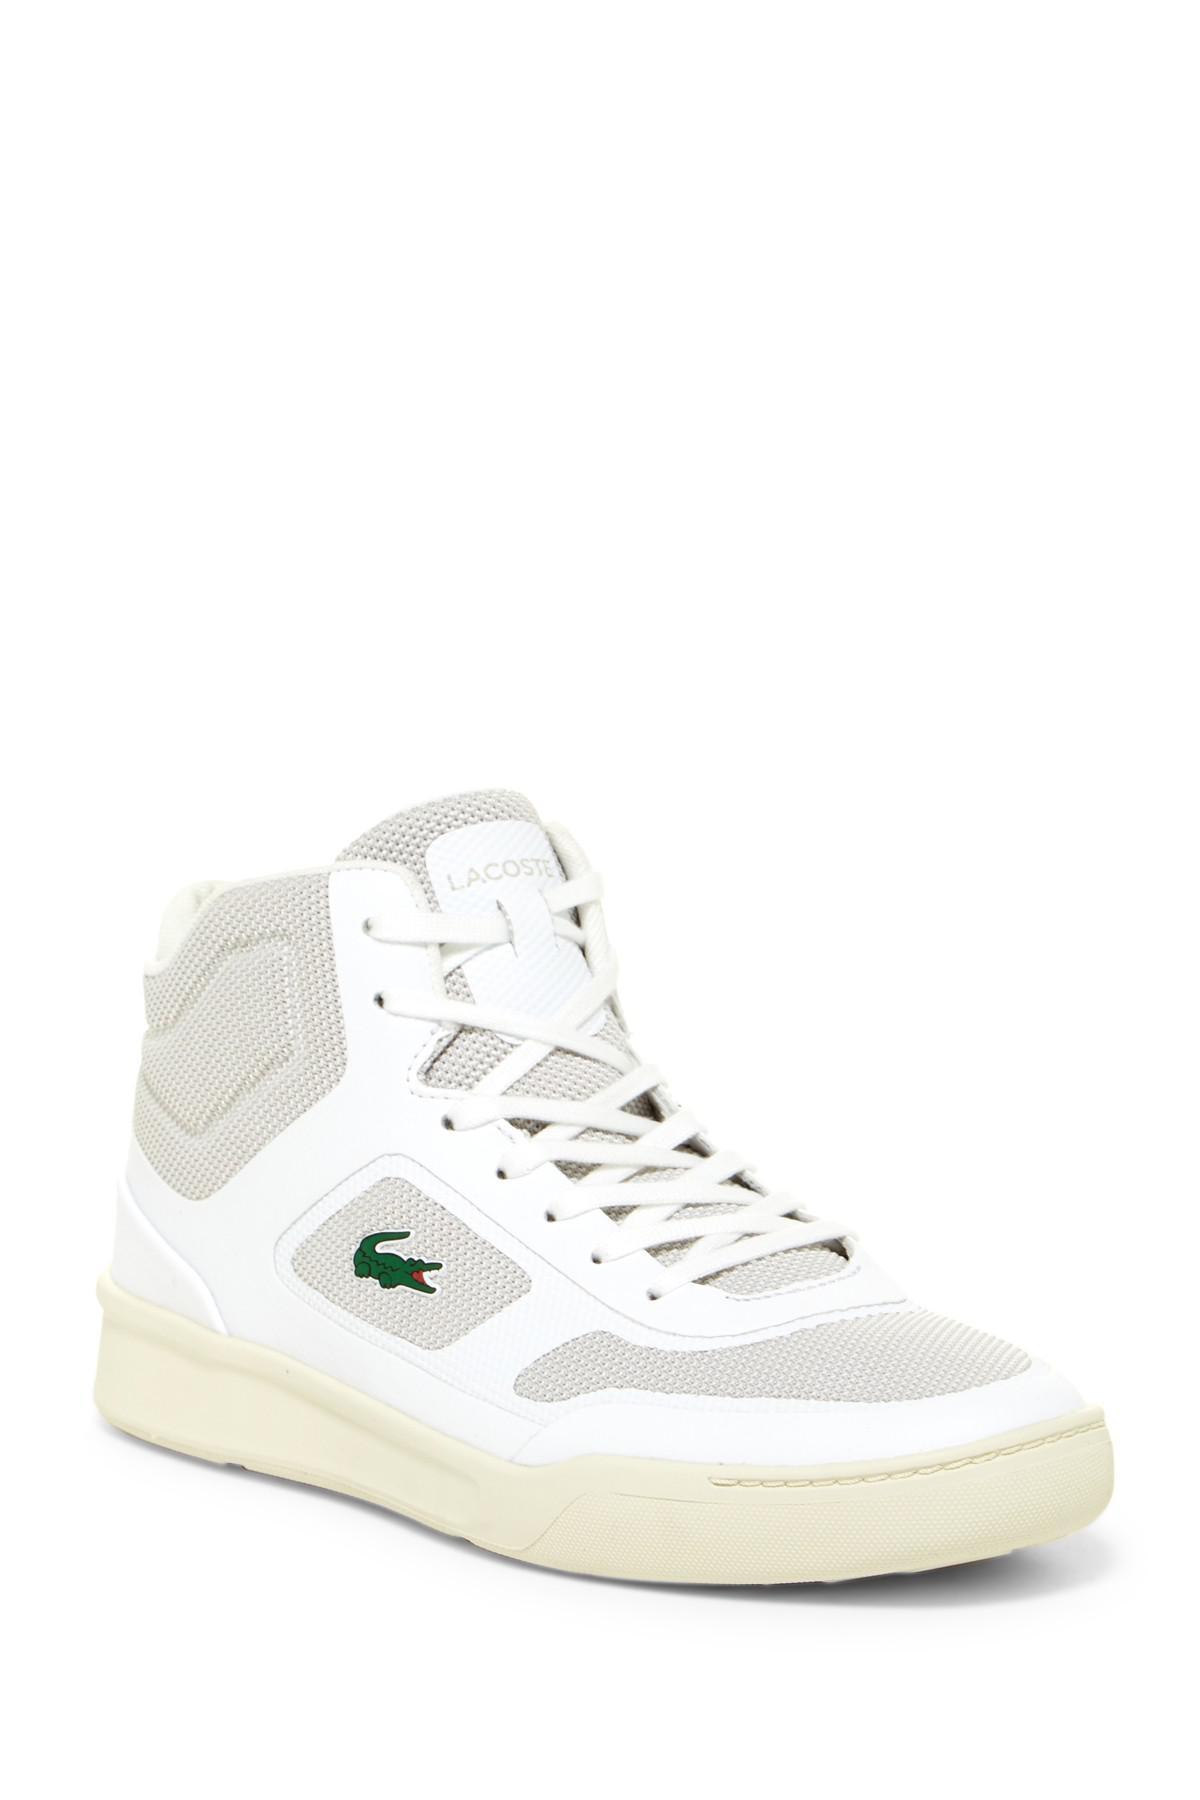 31143c74b0350 Lyst - Lacoste Explorateur Mid Sneaker in White for Men